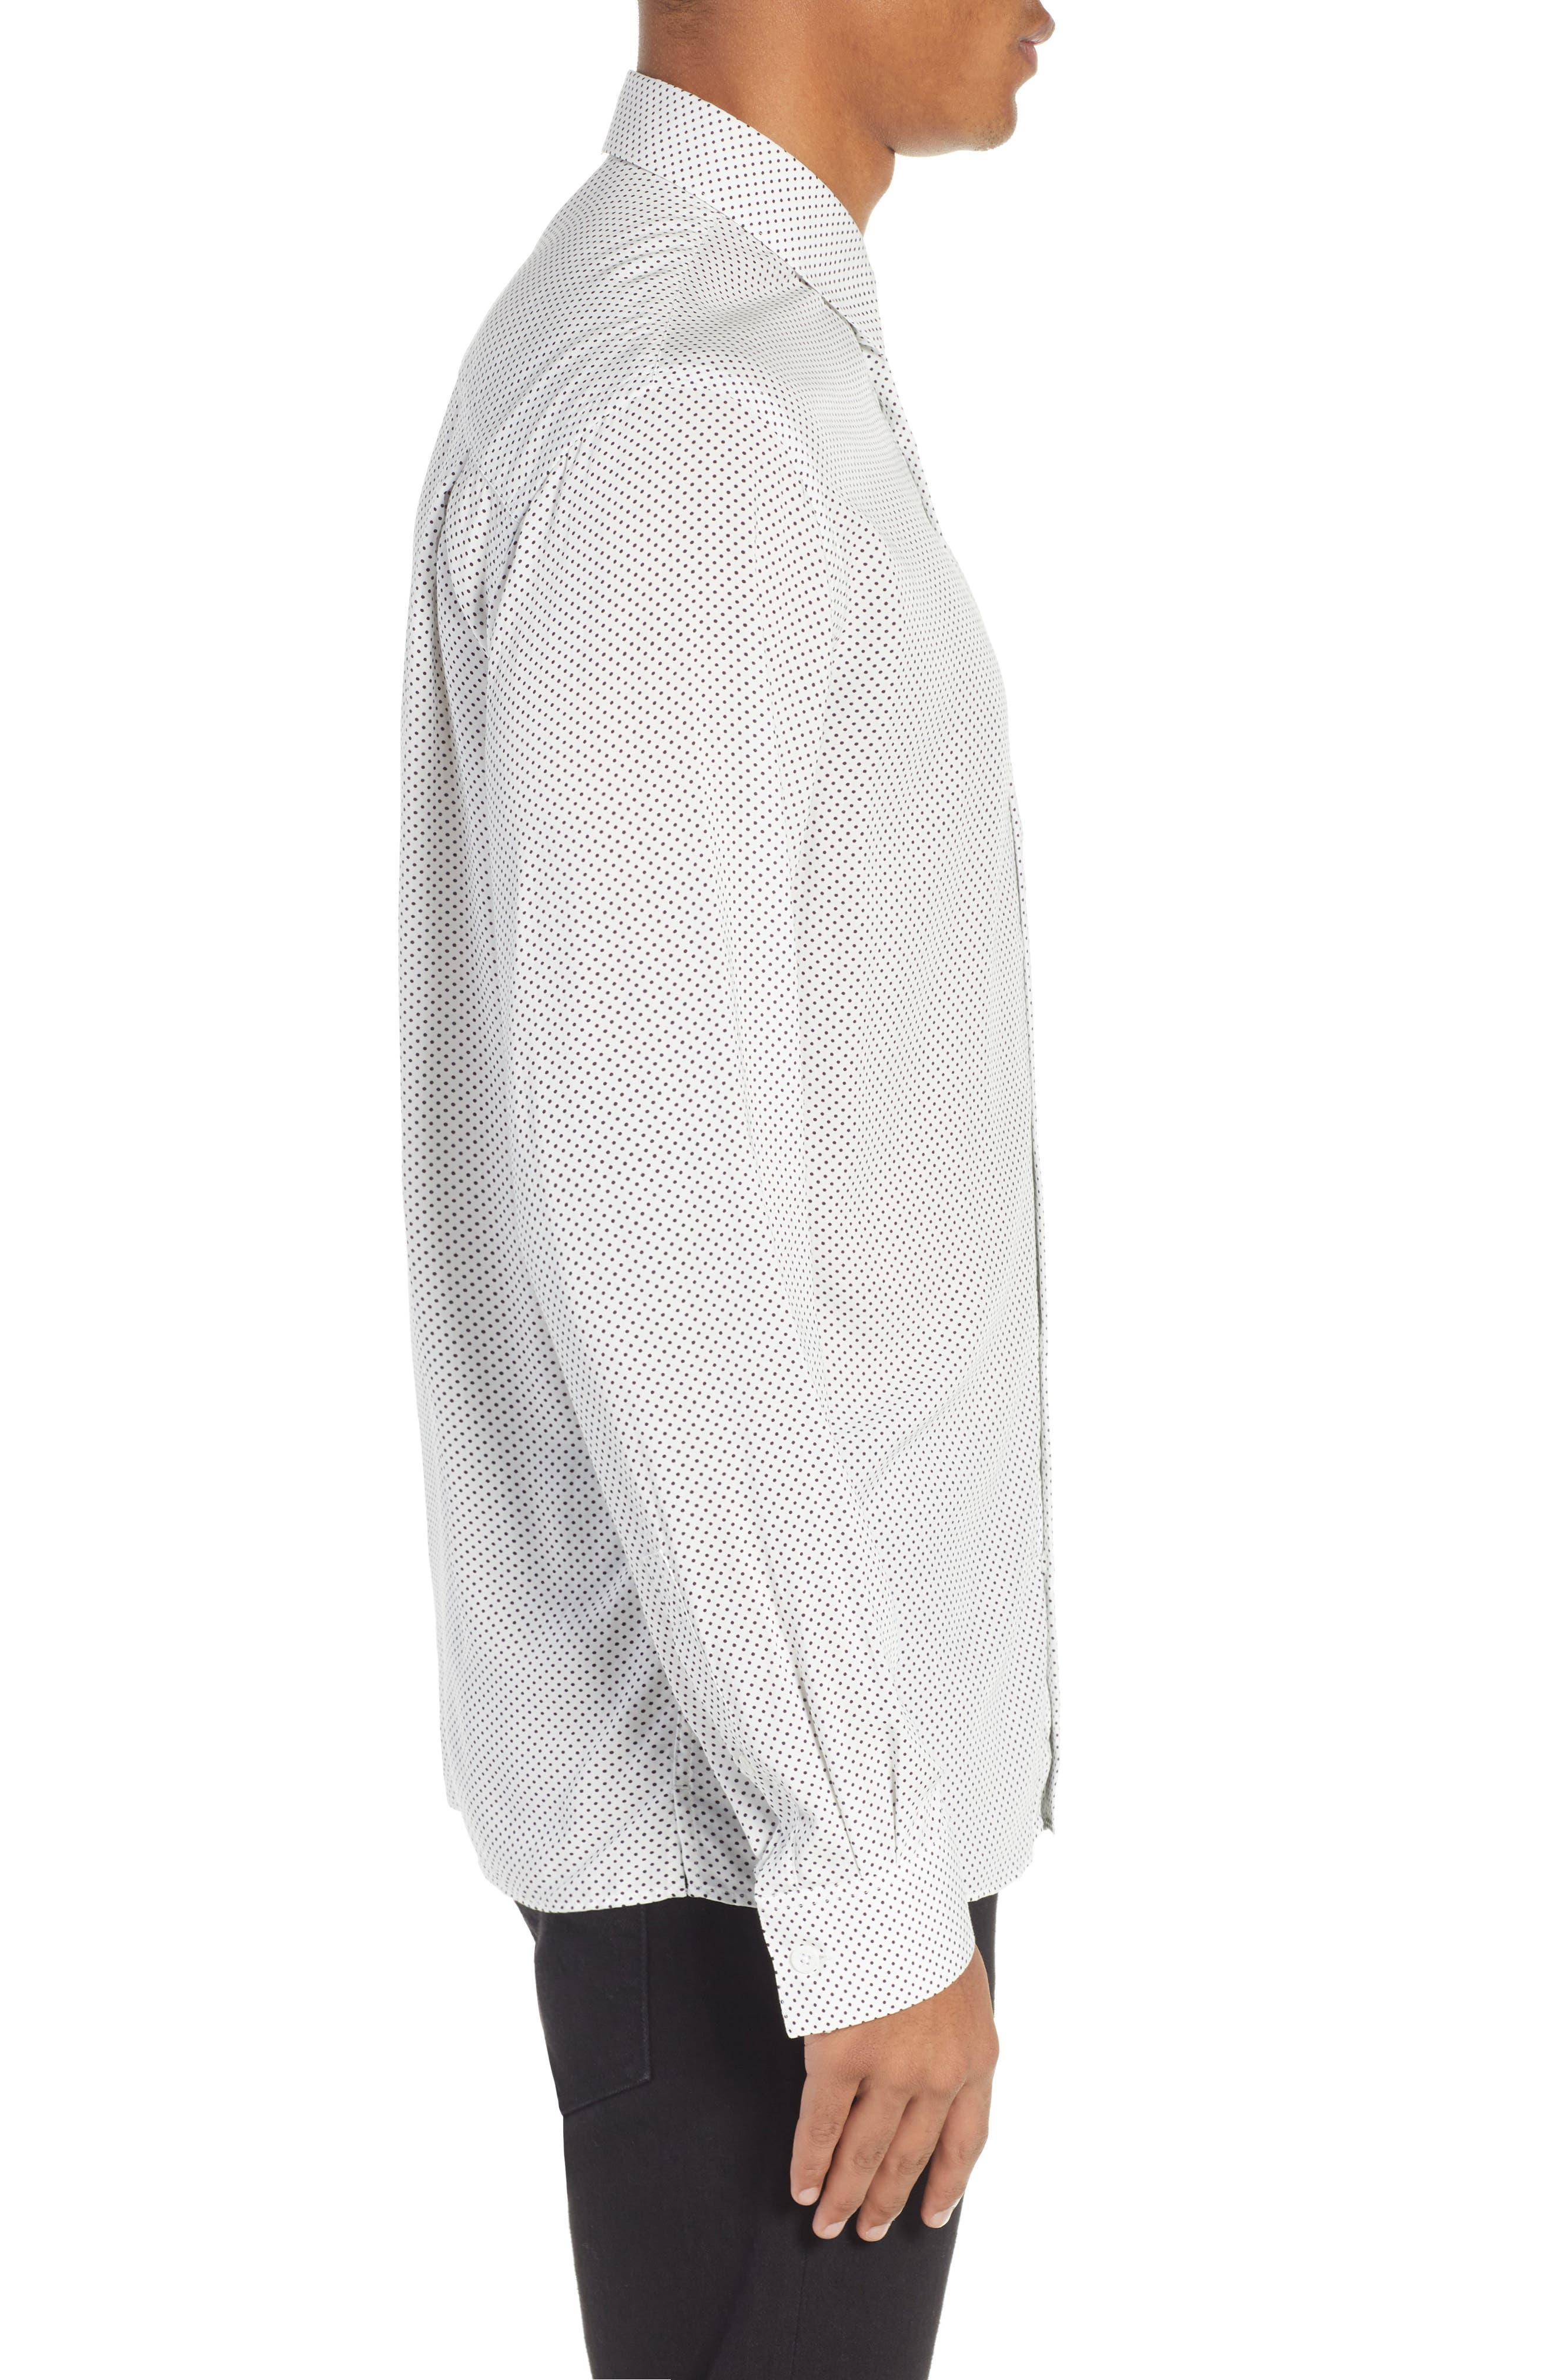 THE KOOPLES, Dot Print Sport Shirt, Alternate thumbnail 4, color, BEIGE-BLACK